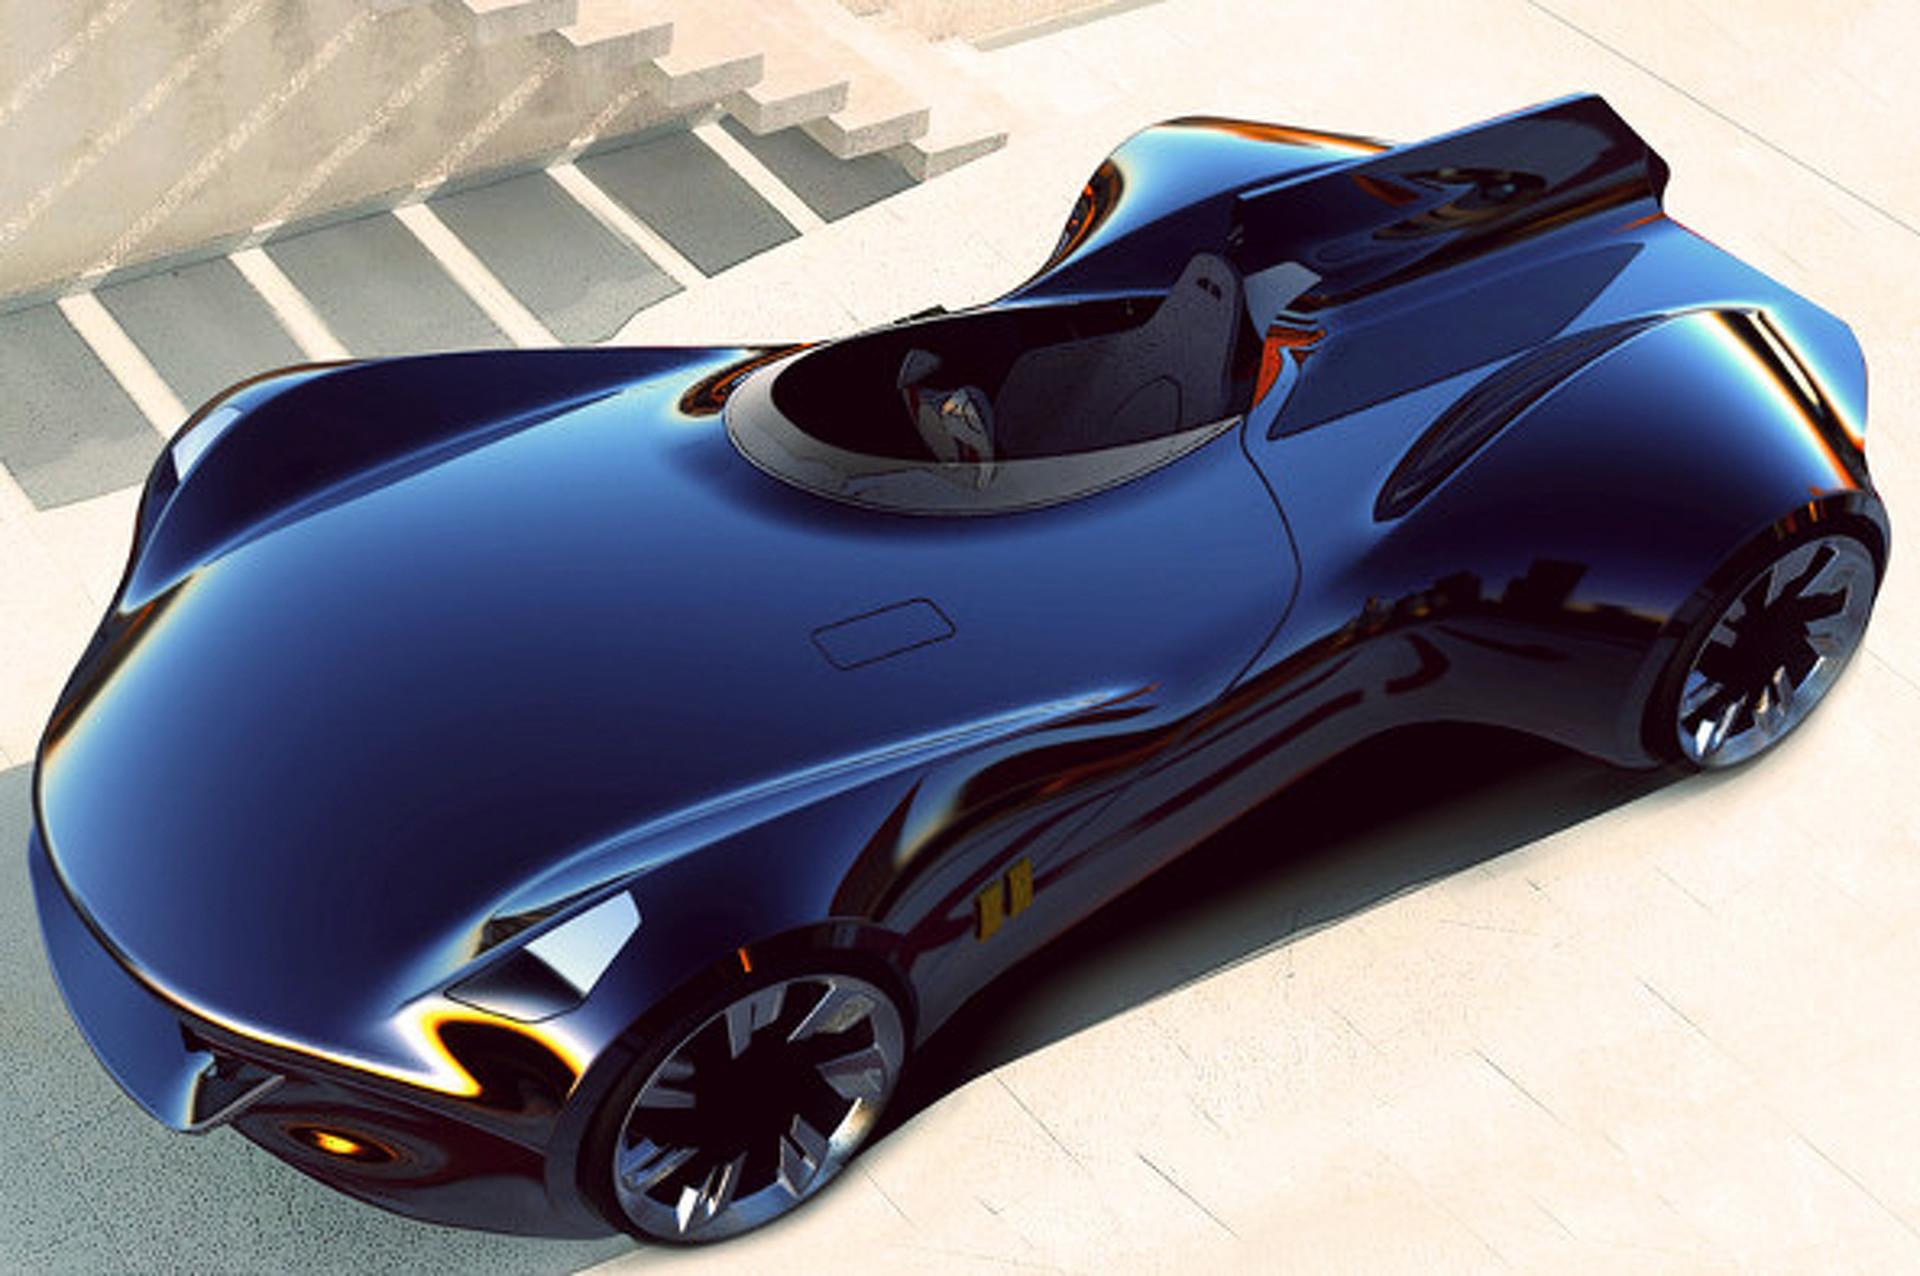 Jaguar XK-I Concept Conjures Iconic Jags of the Past